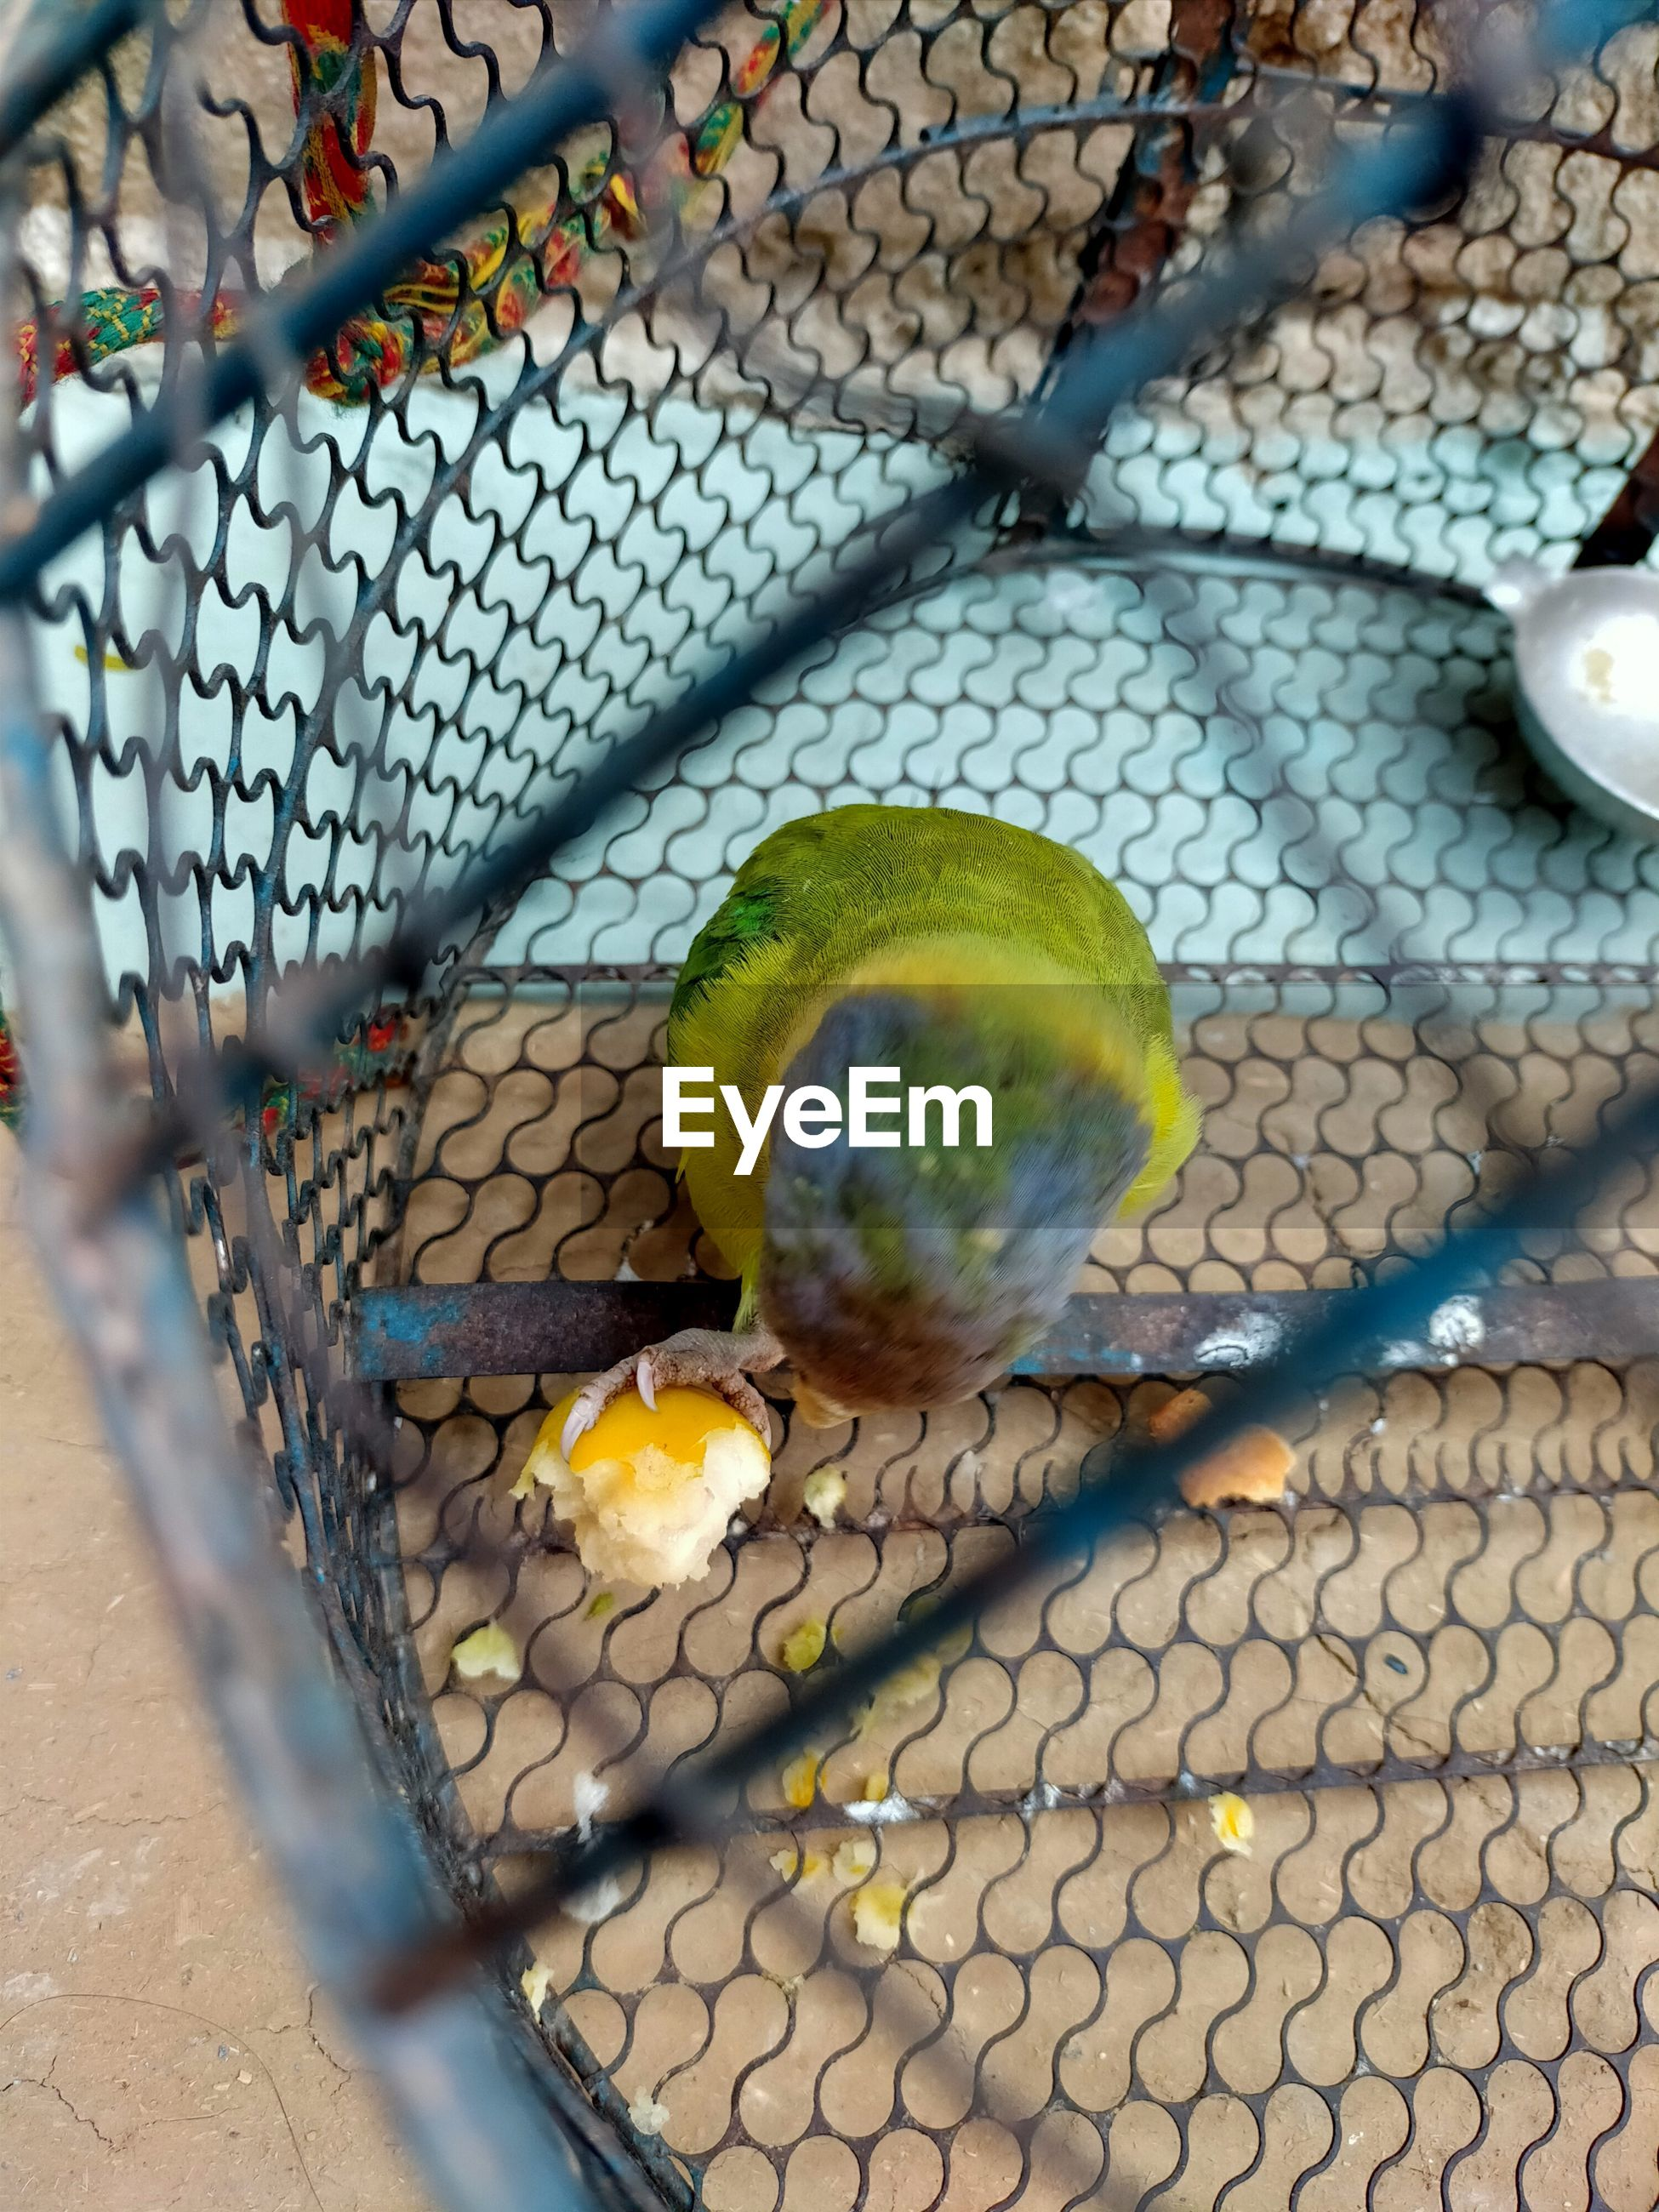 HIGH ANGLE VIEW OF BIRDS ON METAL